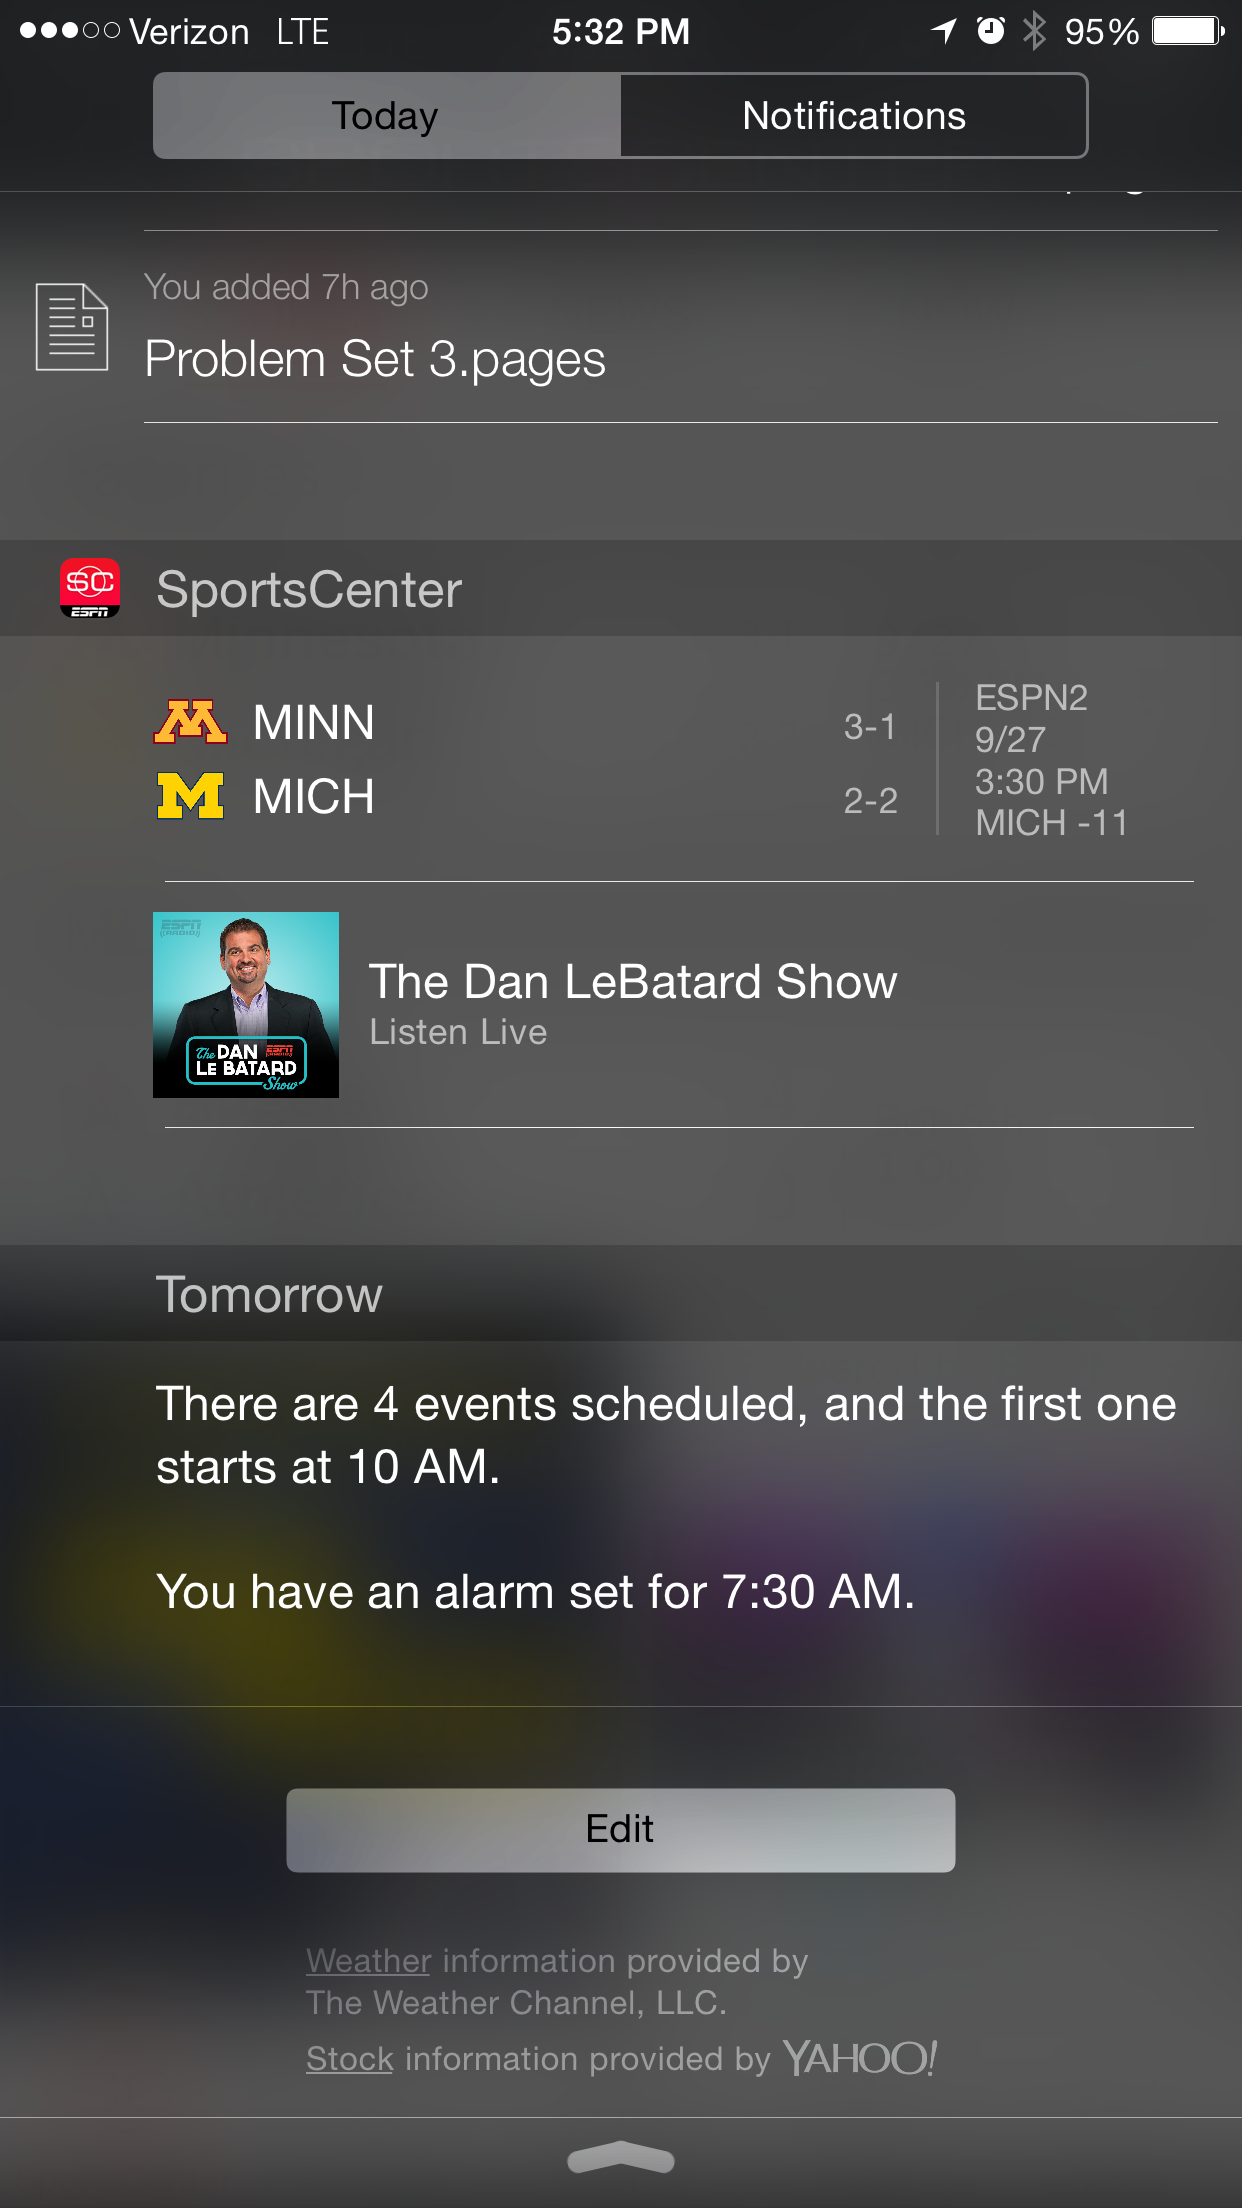 iOS 8's Notification Center gets a new useful widget: ESPN